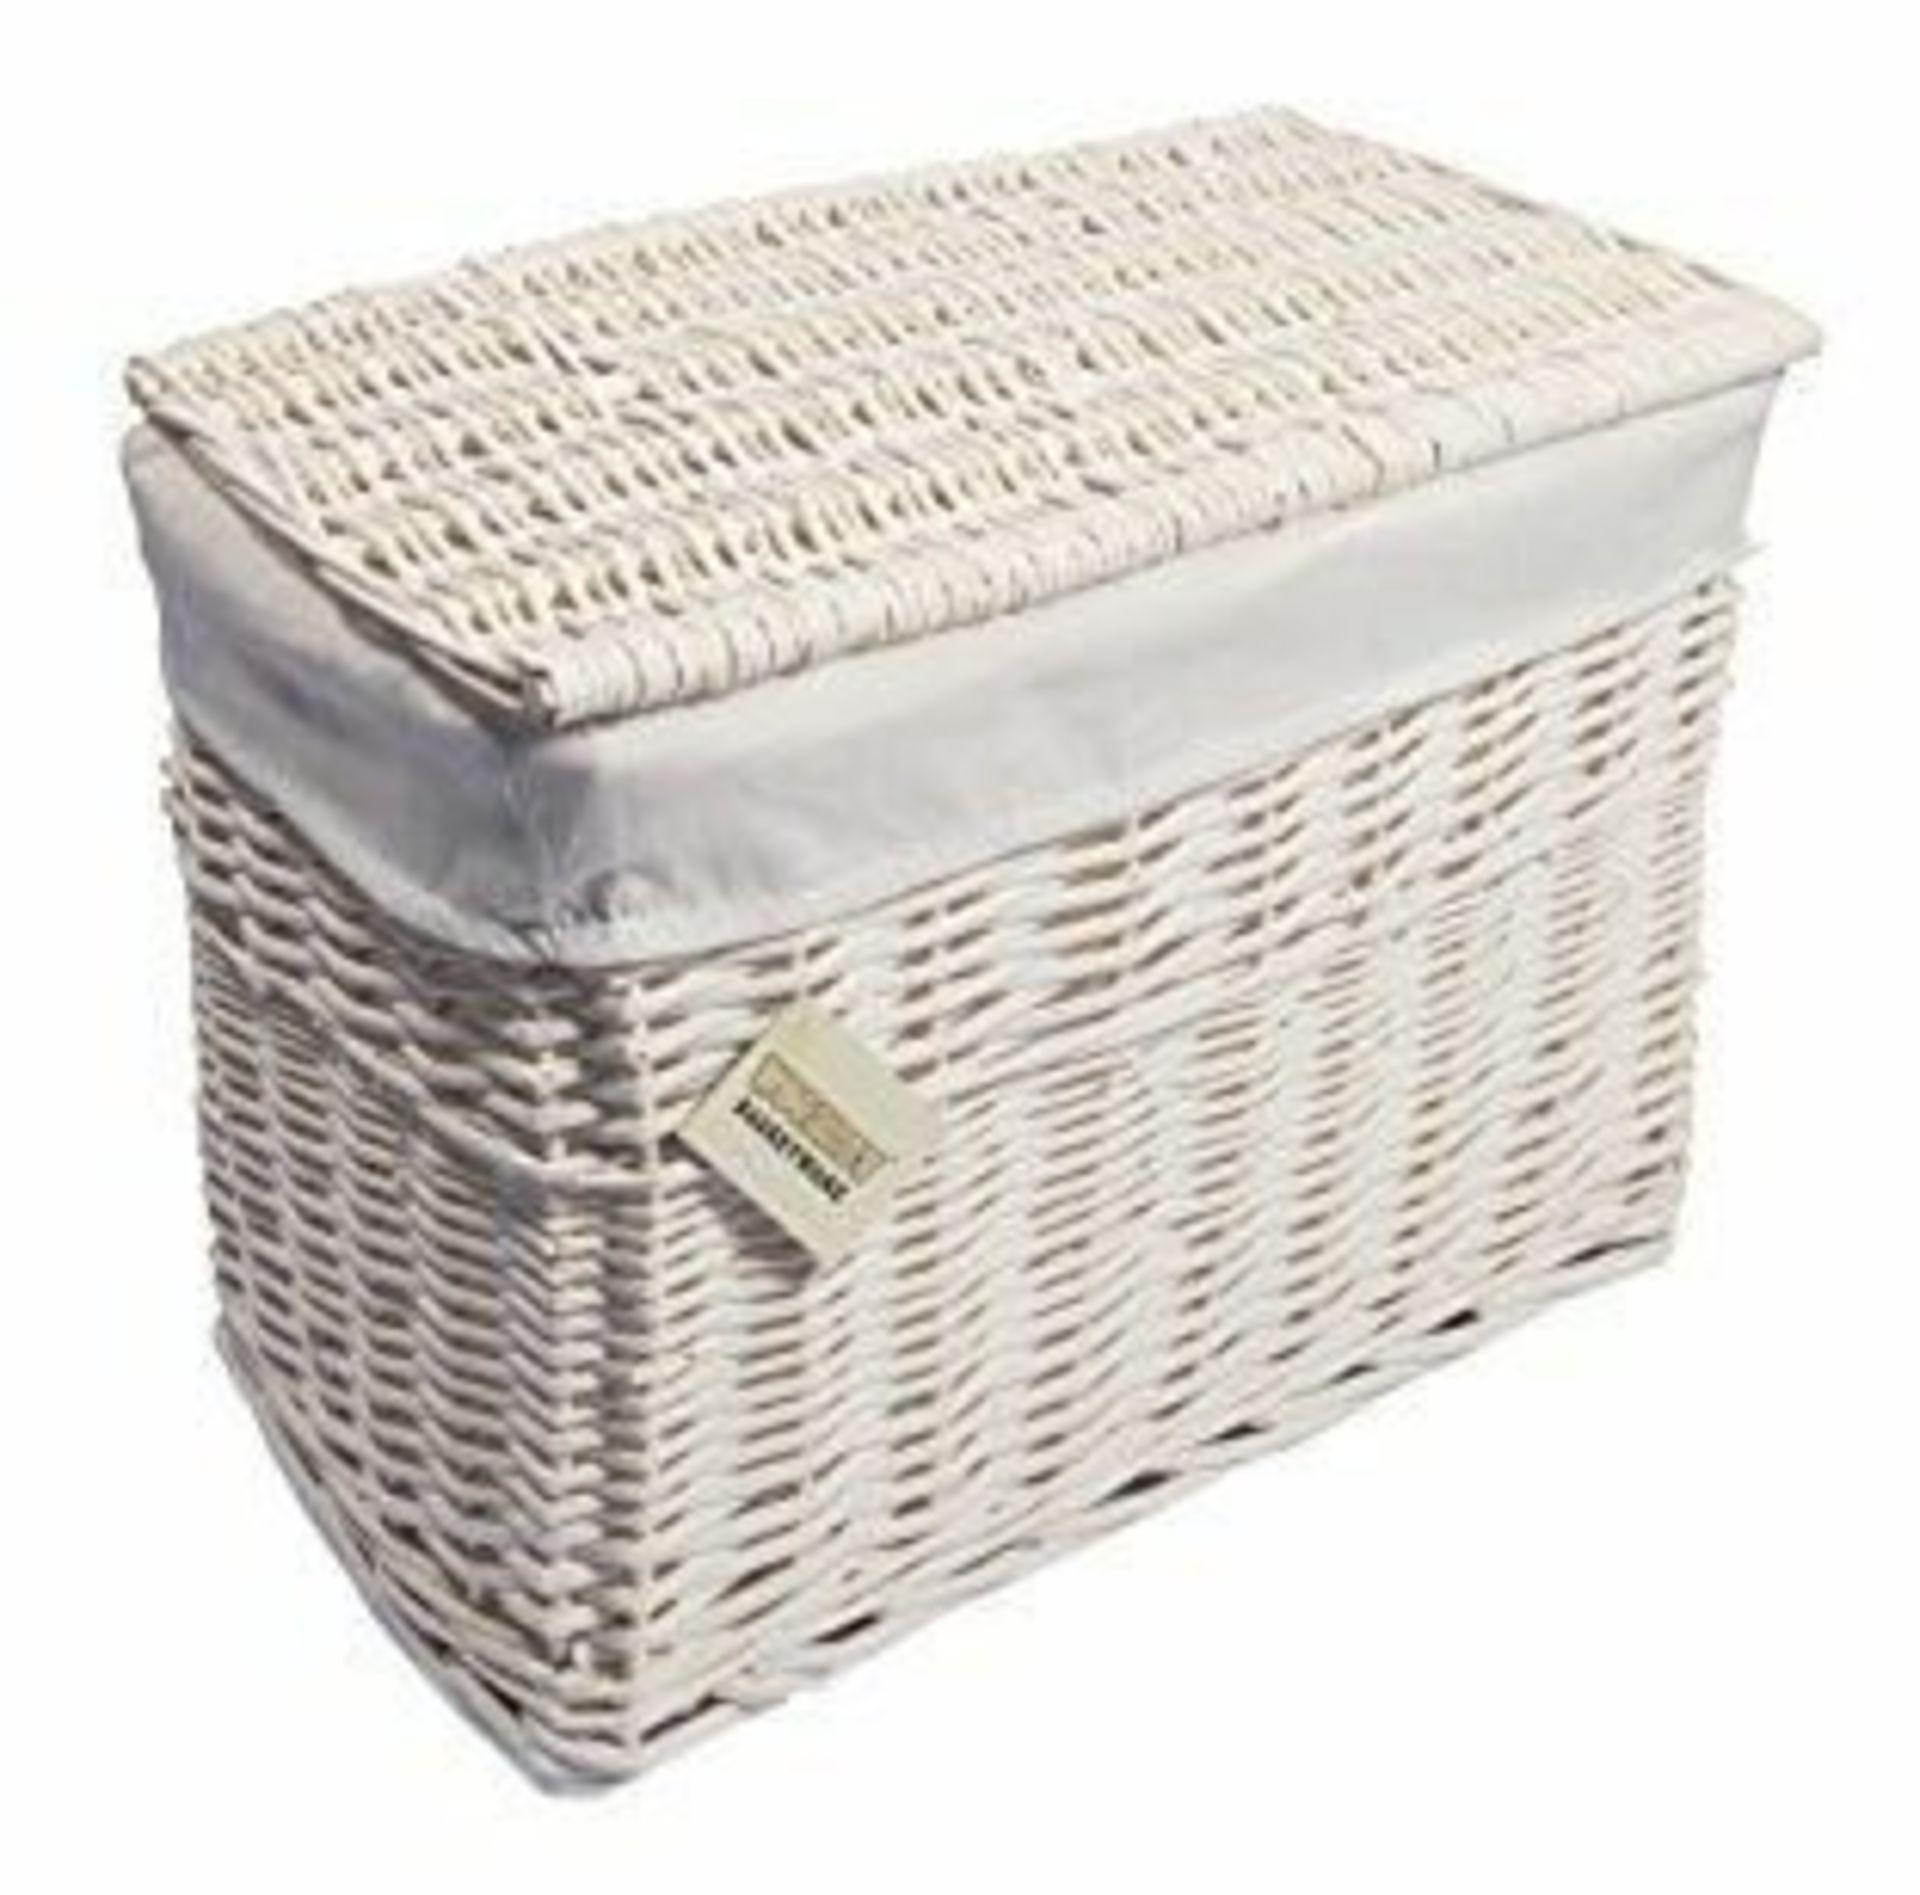 Beachcrest Home, Wicker Hamper Basket (WHITE) - RRP£45.99 (WDLV1163 - 22262/16) 1J